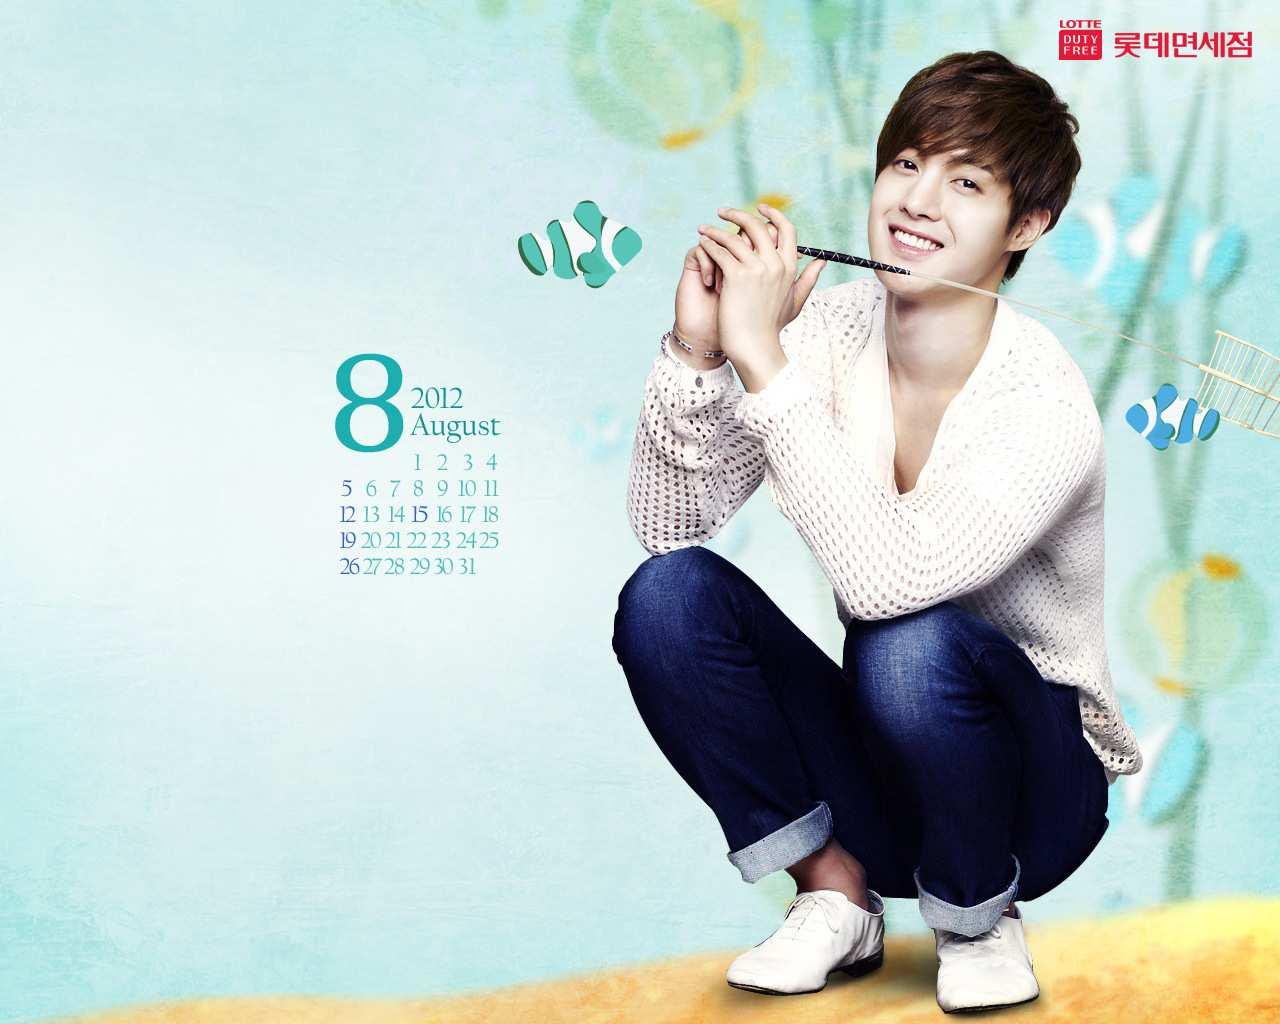 Google themes korean - Google Theme Kim Hyun Joong Pics Kim Hyun Joong Lotte Duty Free August 2012 Wallpaper